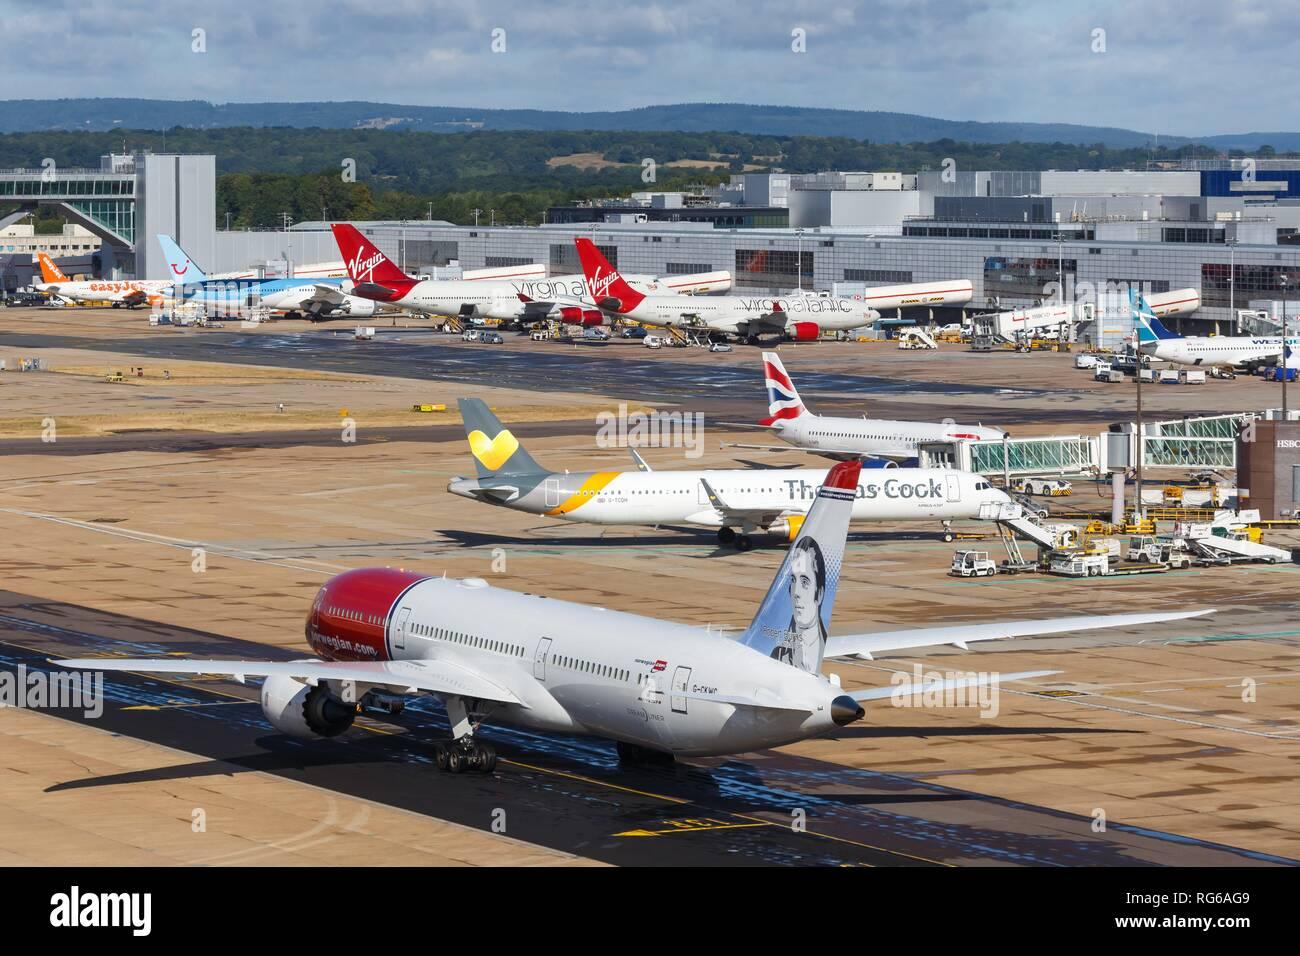 London, United Kingdom - July 31, 2018: Norwegian Boeing 787 airplane at London Gatwick airport (LGW) in the United Kingdom. | usage worldwide - Stock Image